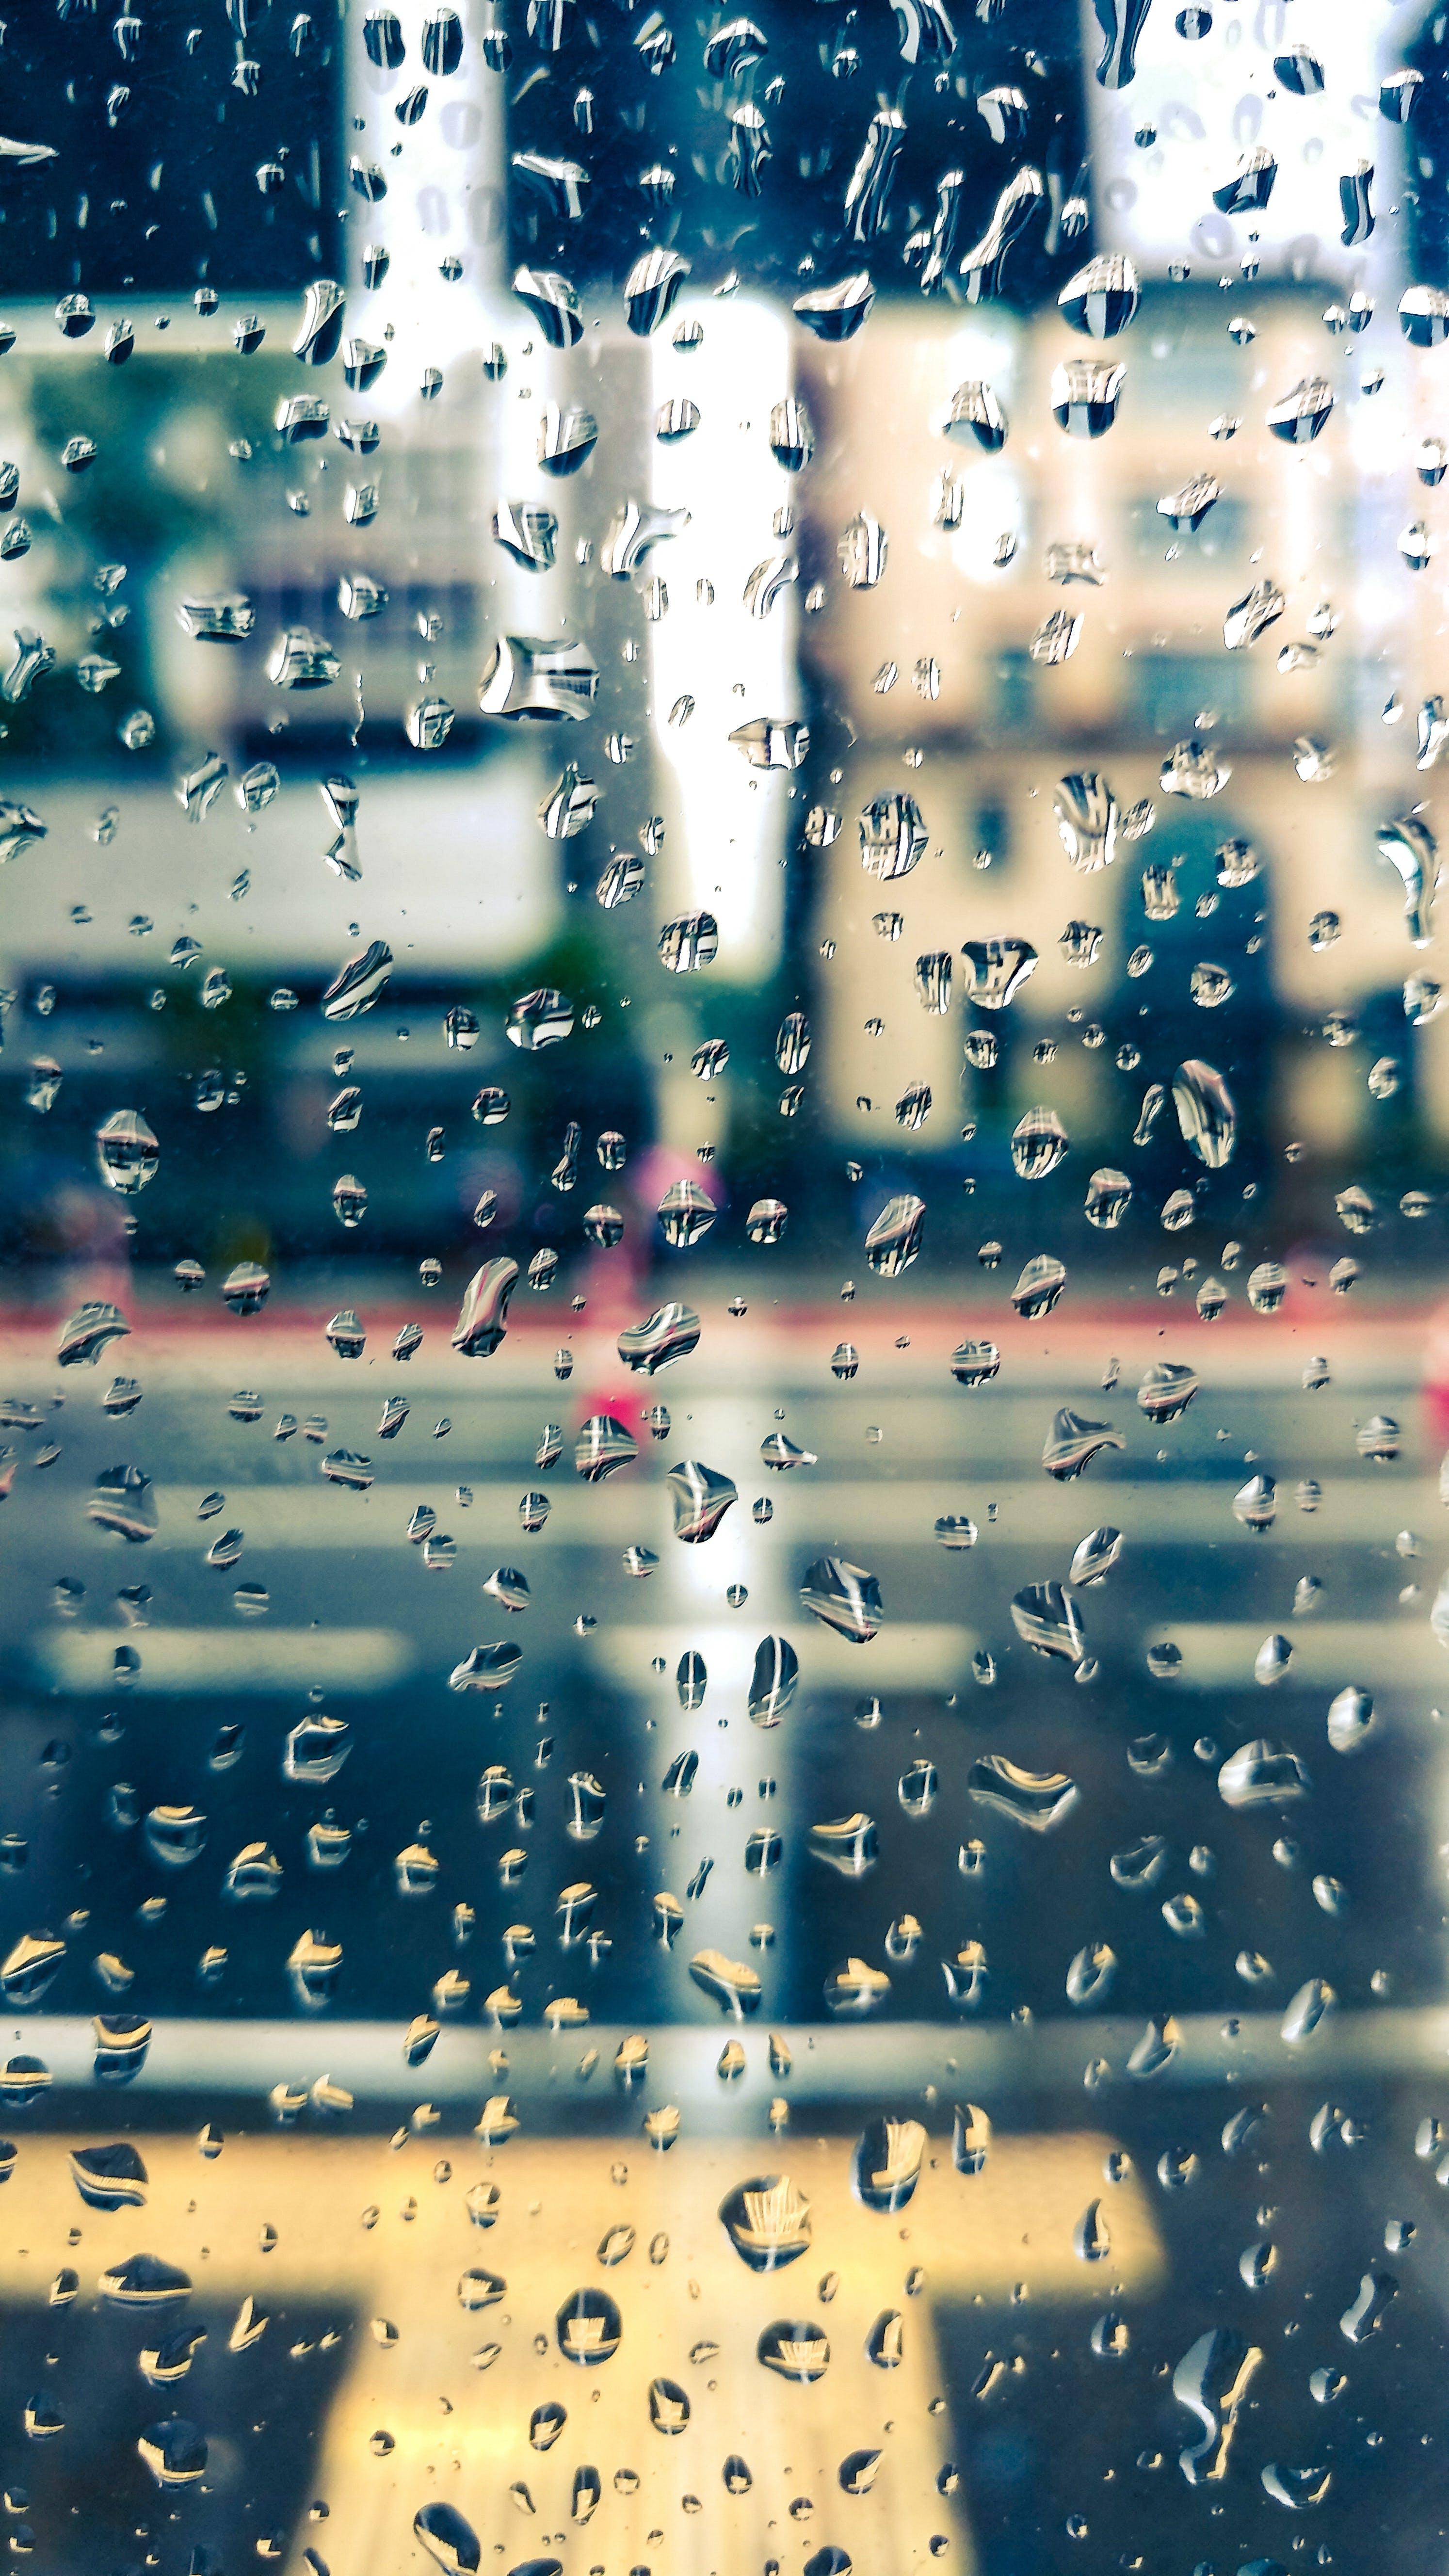 Free stock photo of water, rain, drop of water, drop